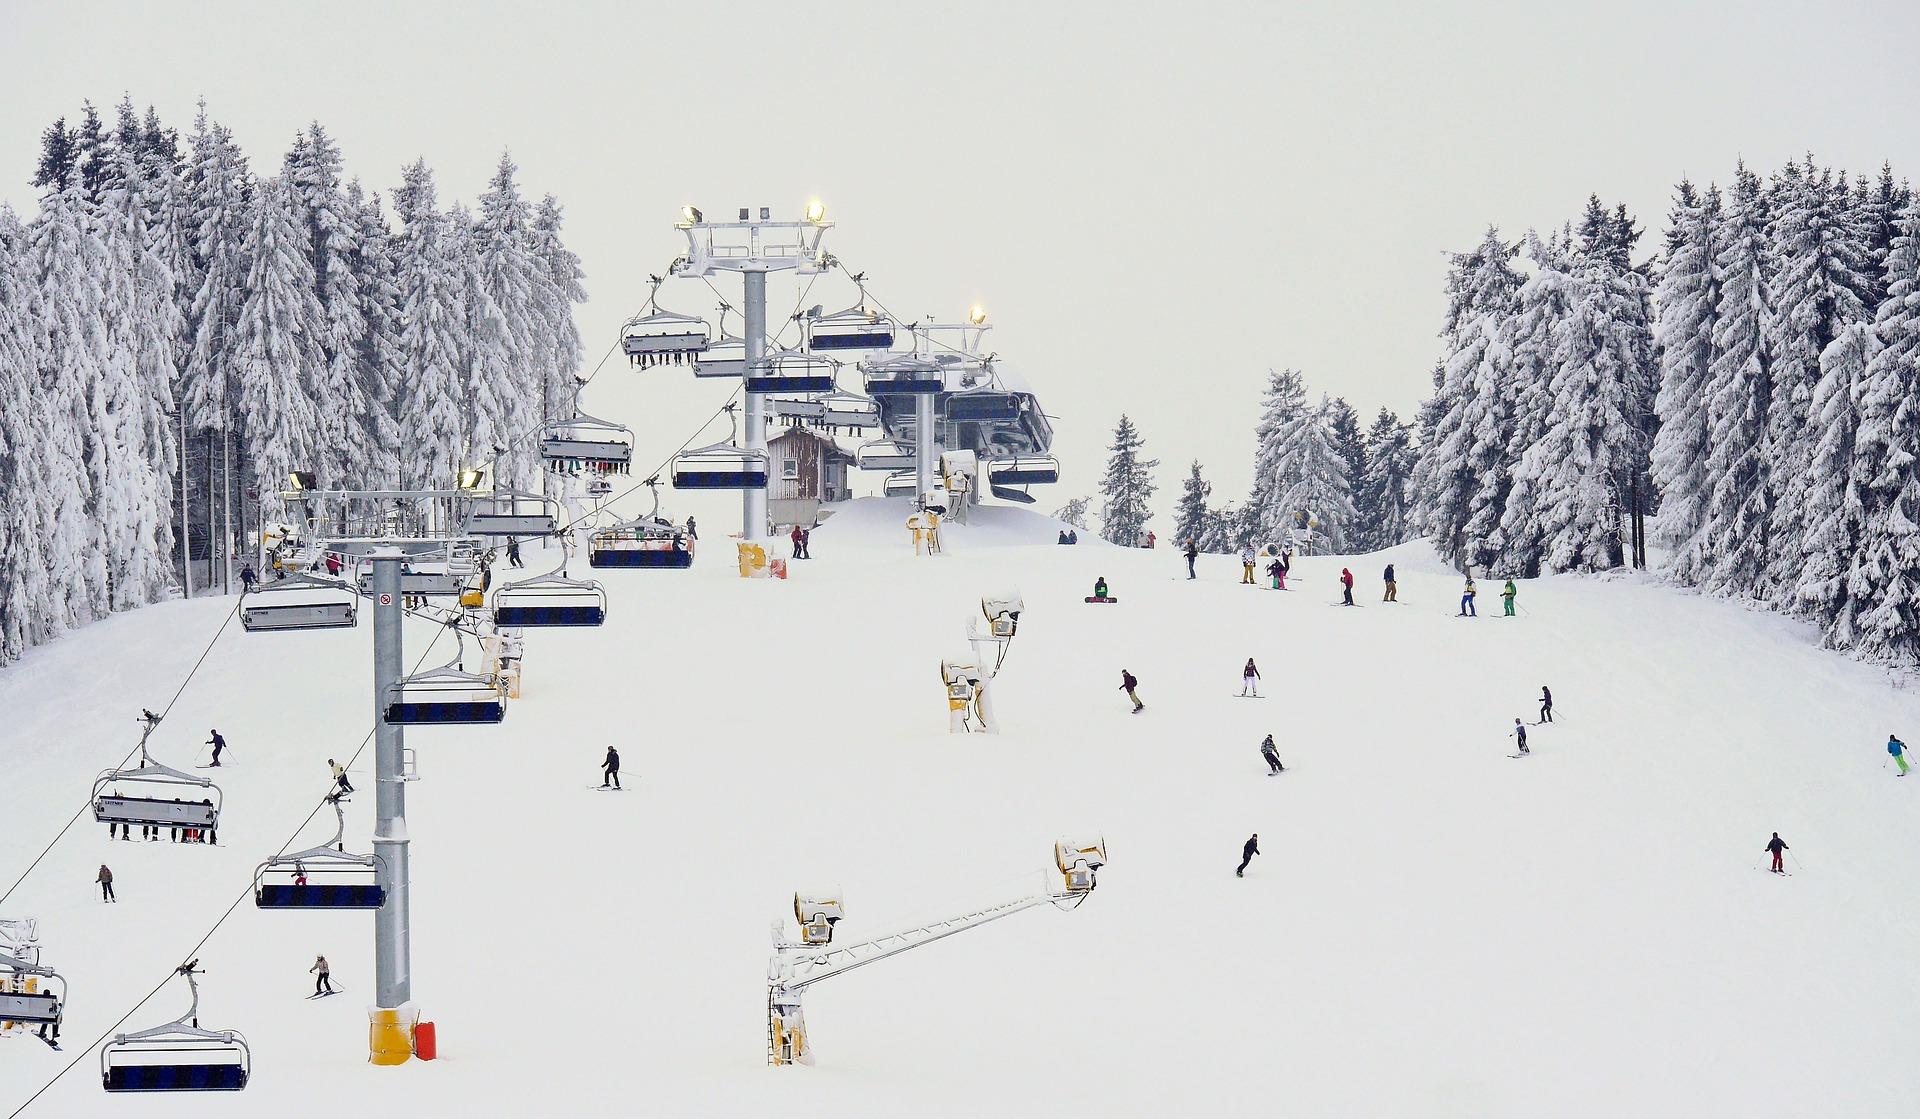 winterberg skiing snowboarding pixabay winter sports